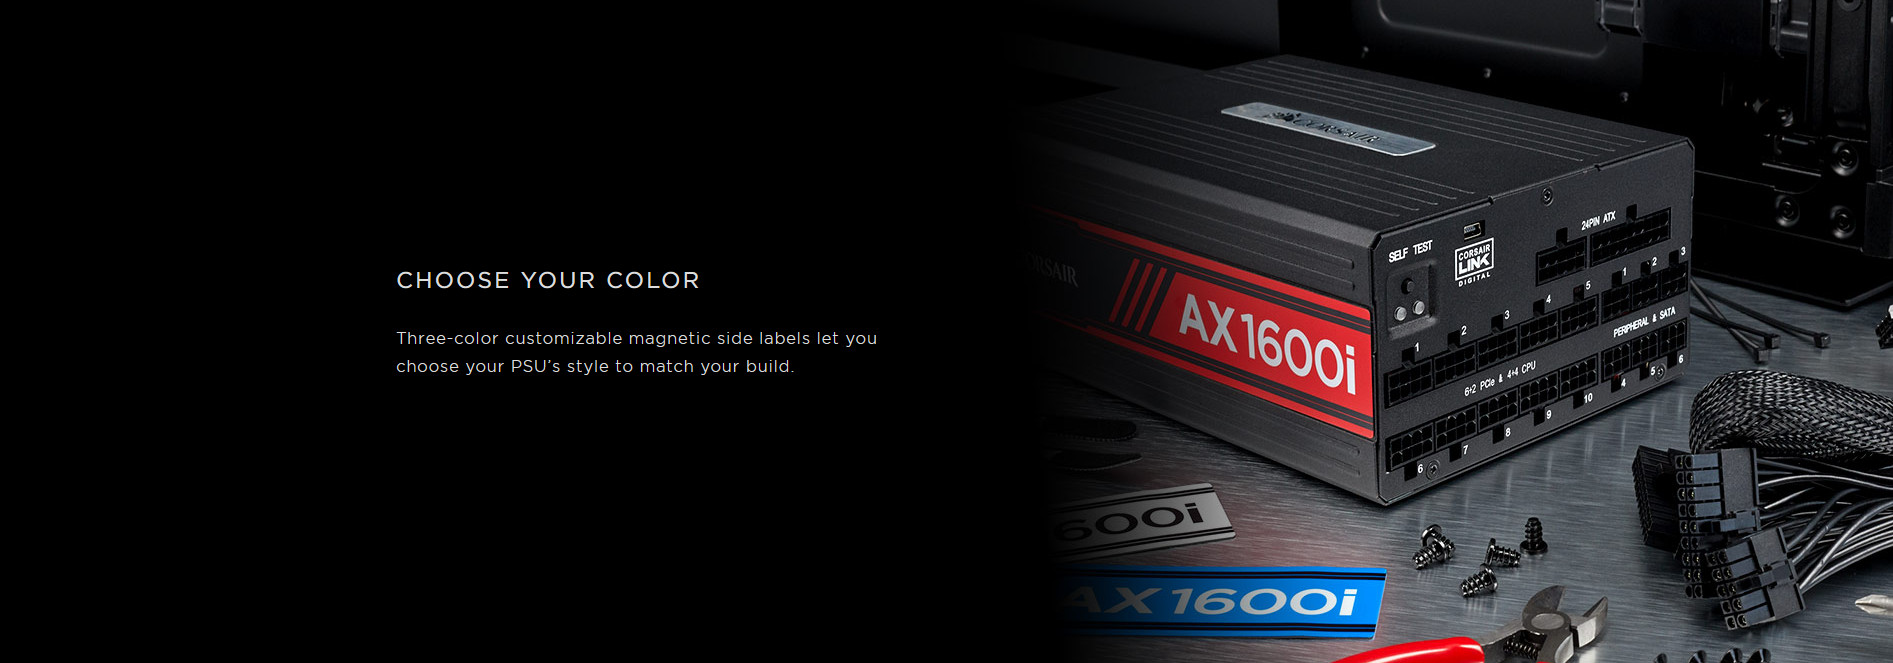 Nguồn Corsair AX1600i 1600W (80 Plus Titanium/ Full Modular/Màu Đen) giới thiệu 3